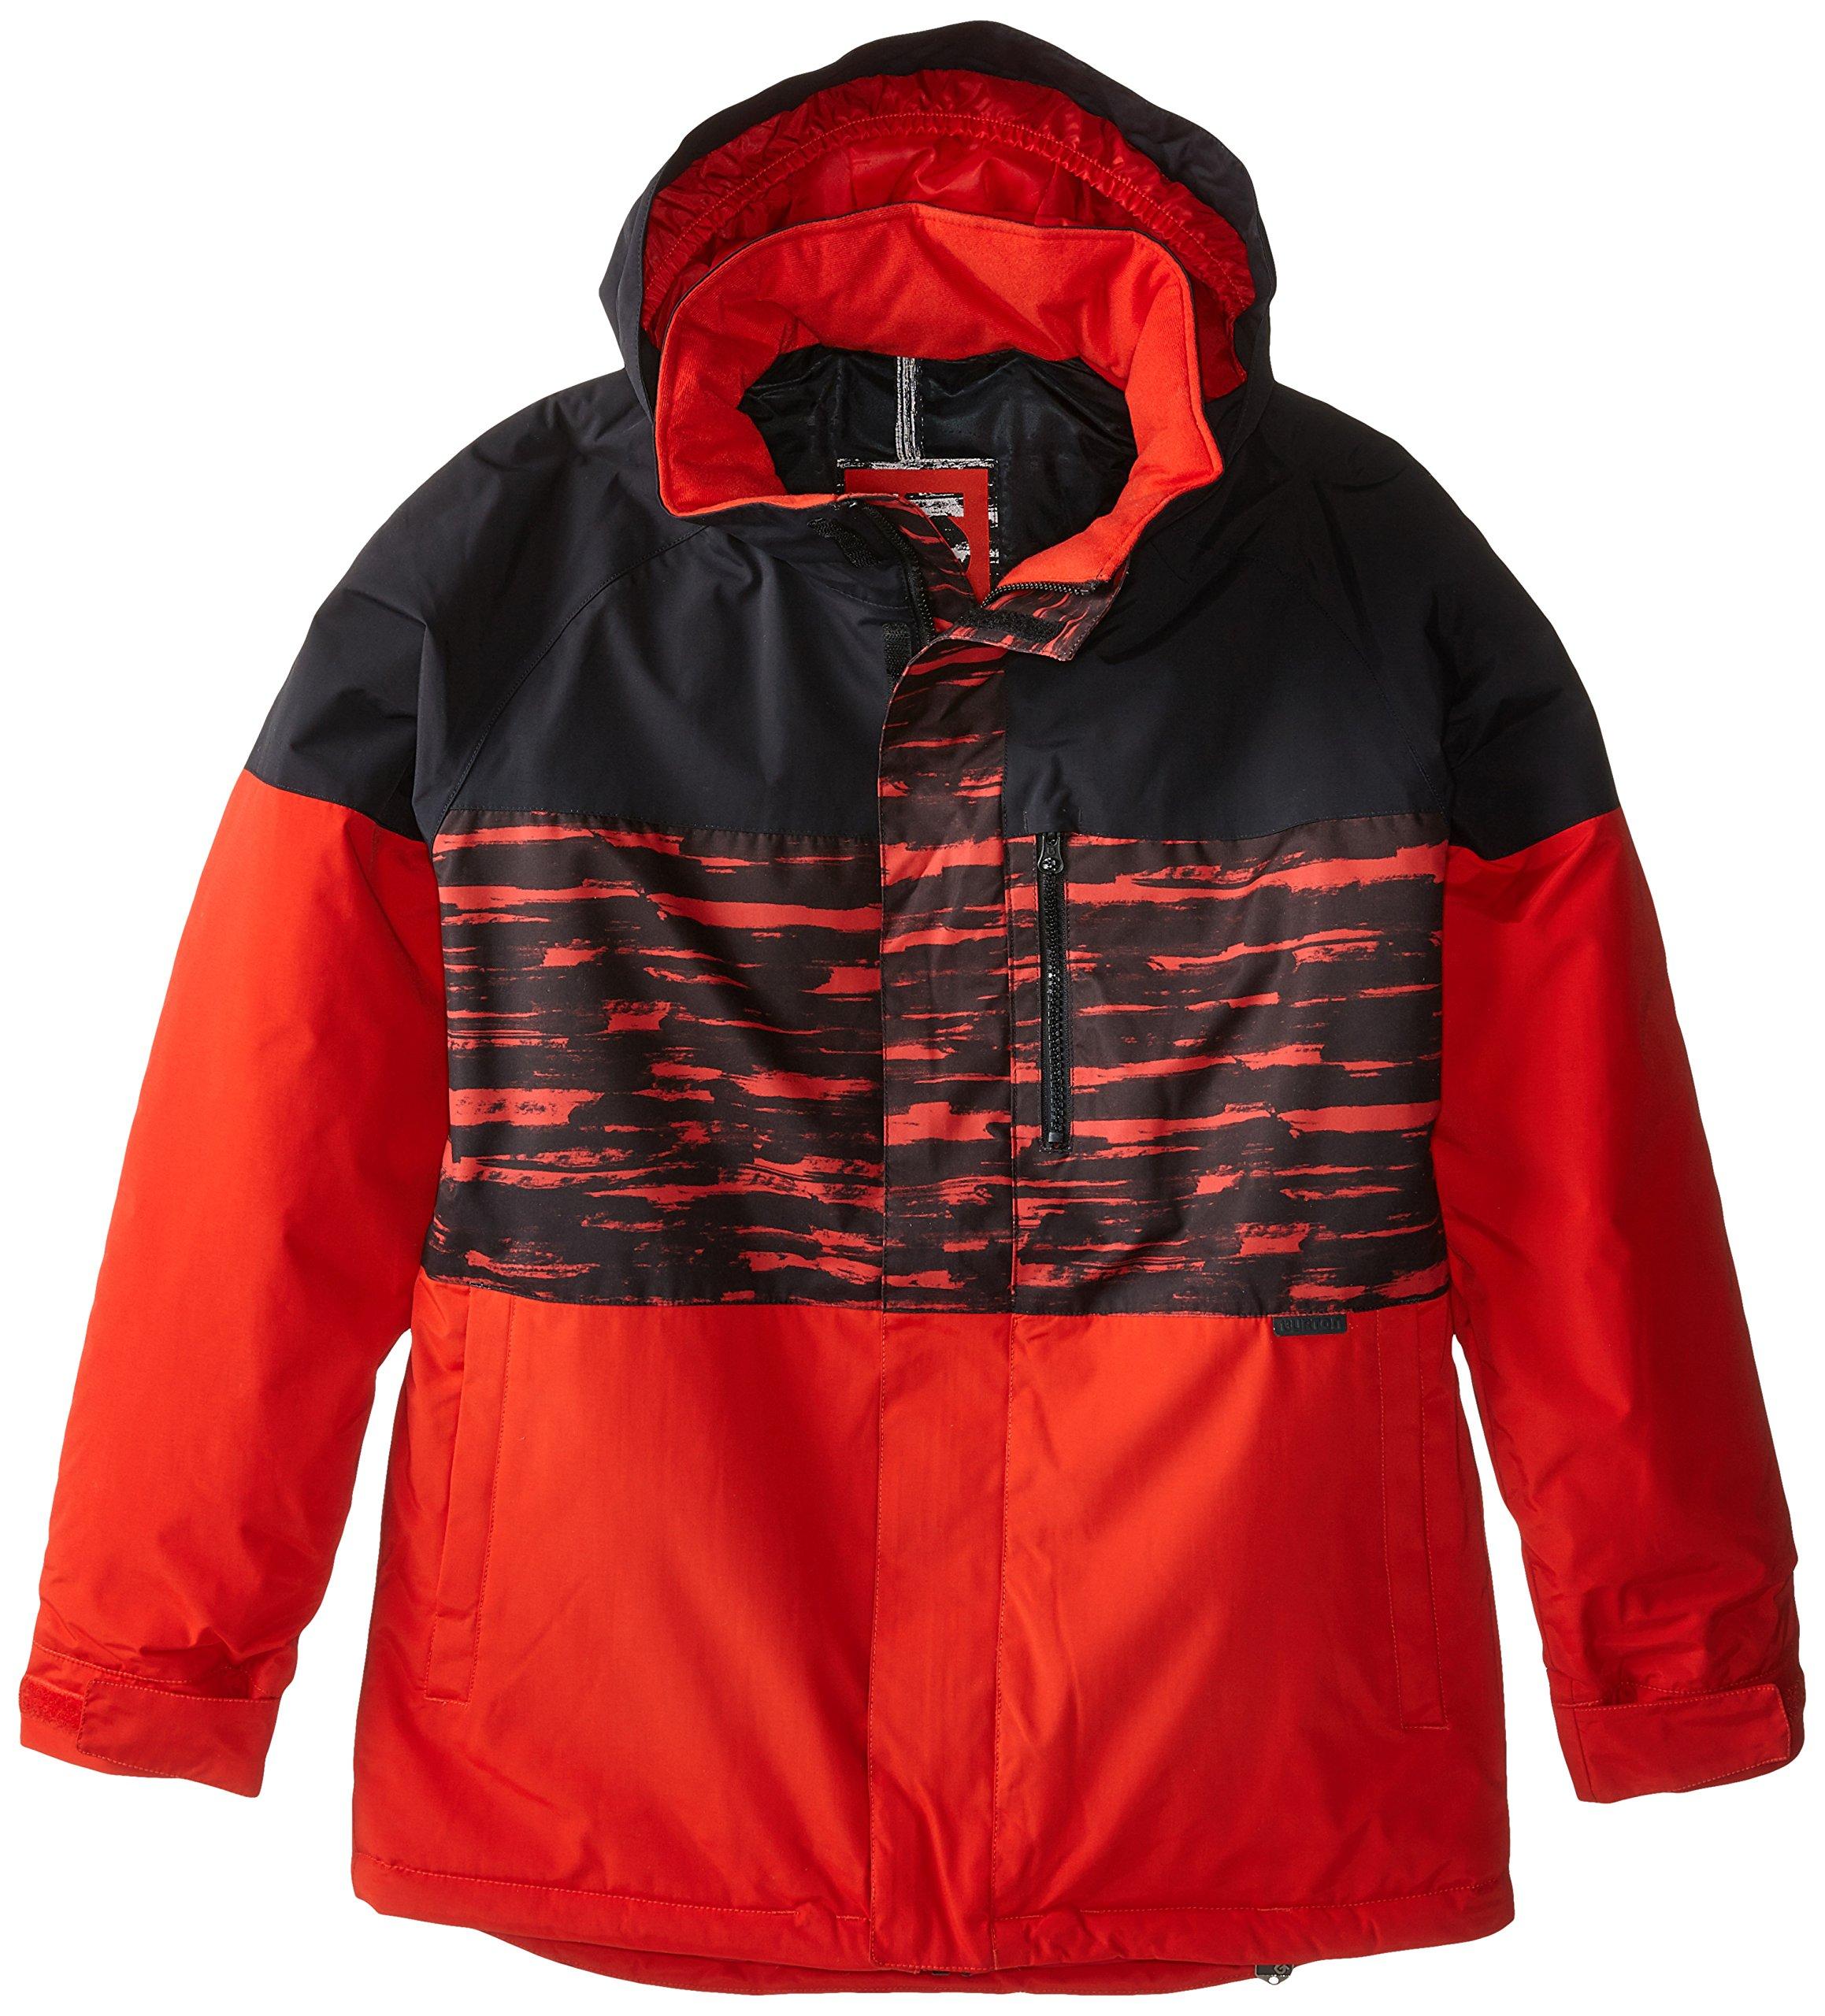 c2895d446bc4 Amazon.com   Burton Symbol Snowboard Jacket Kids   Sports   Outdoors